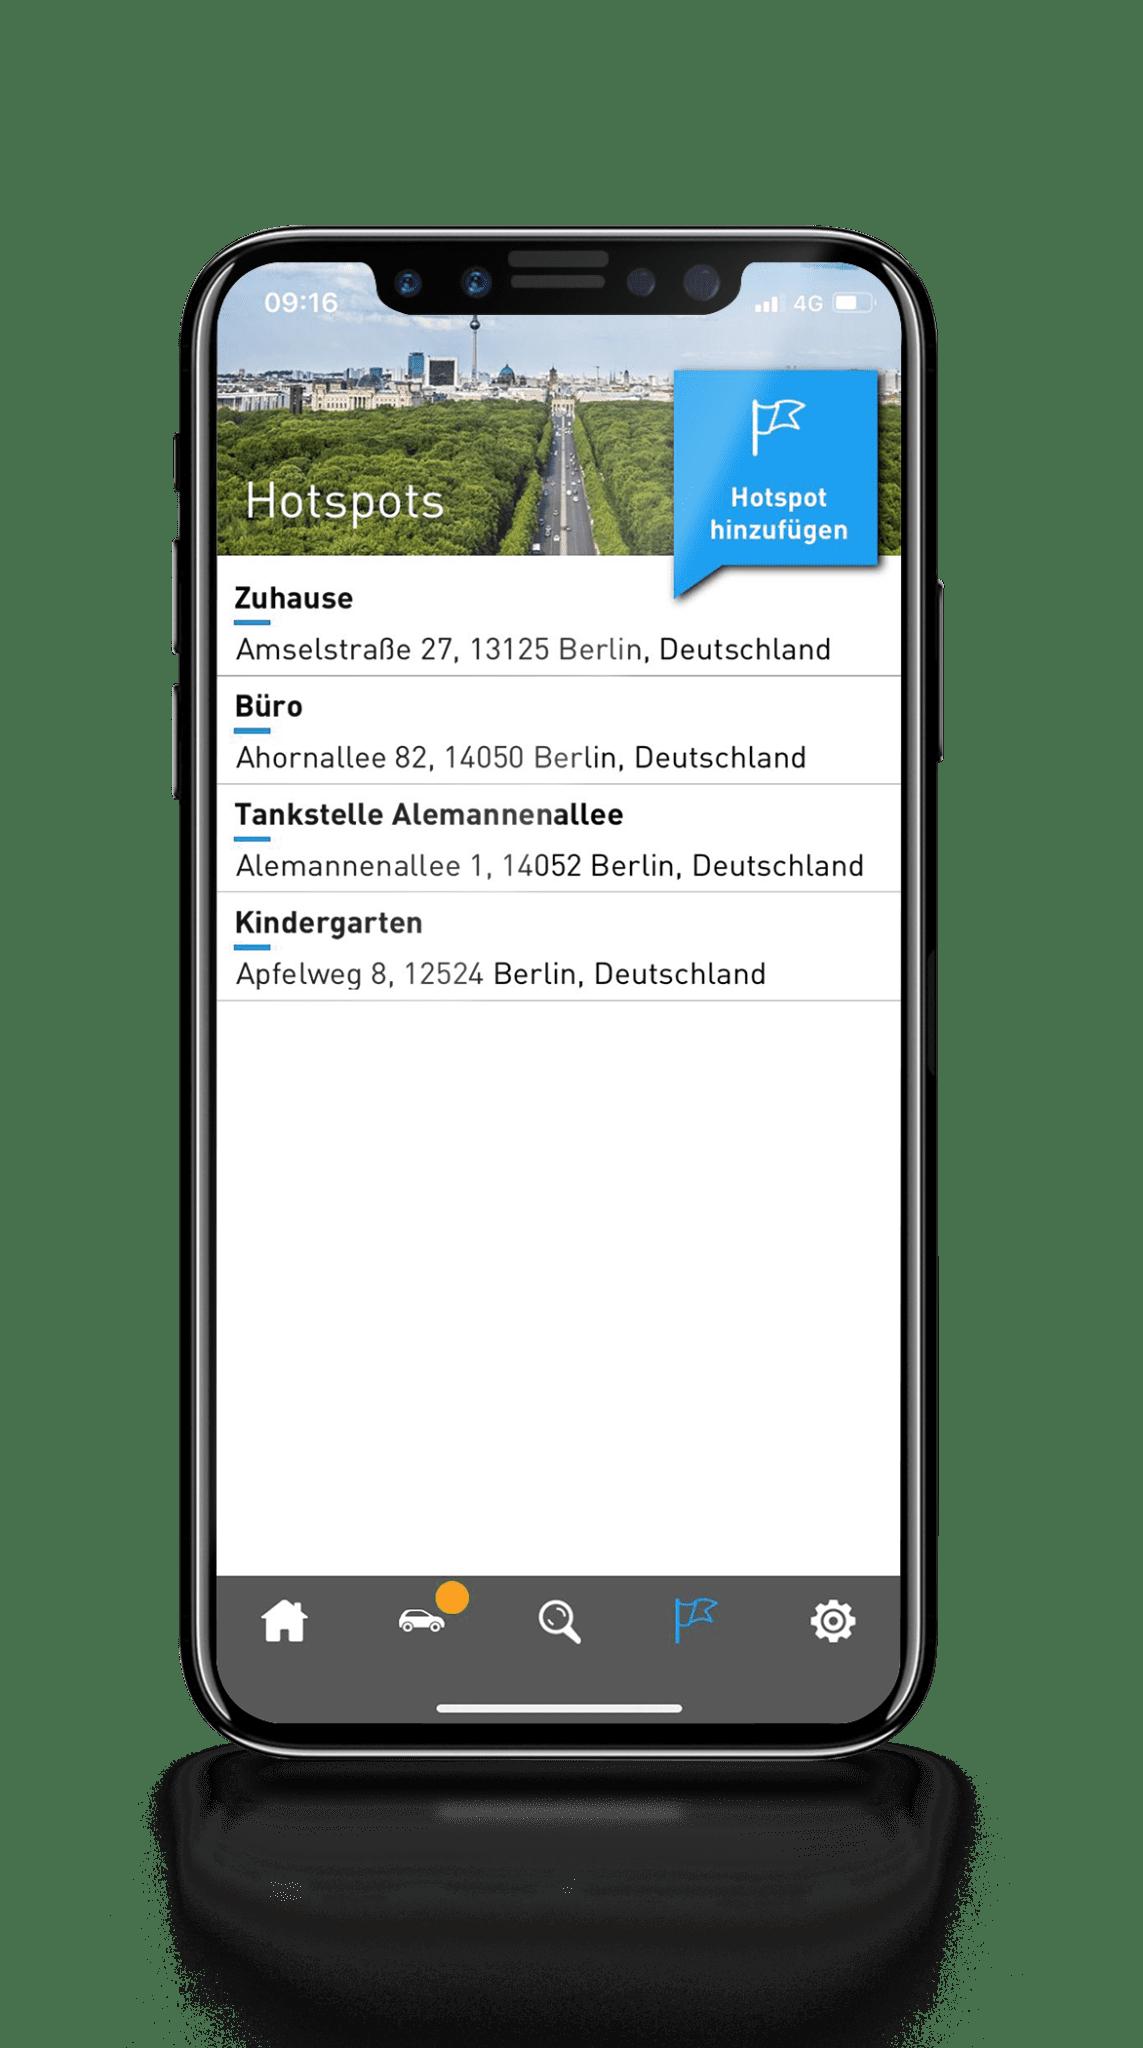 AutoLogg App - Hotspots anlegen